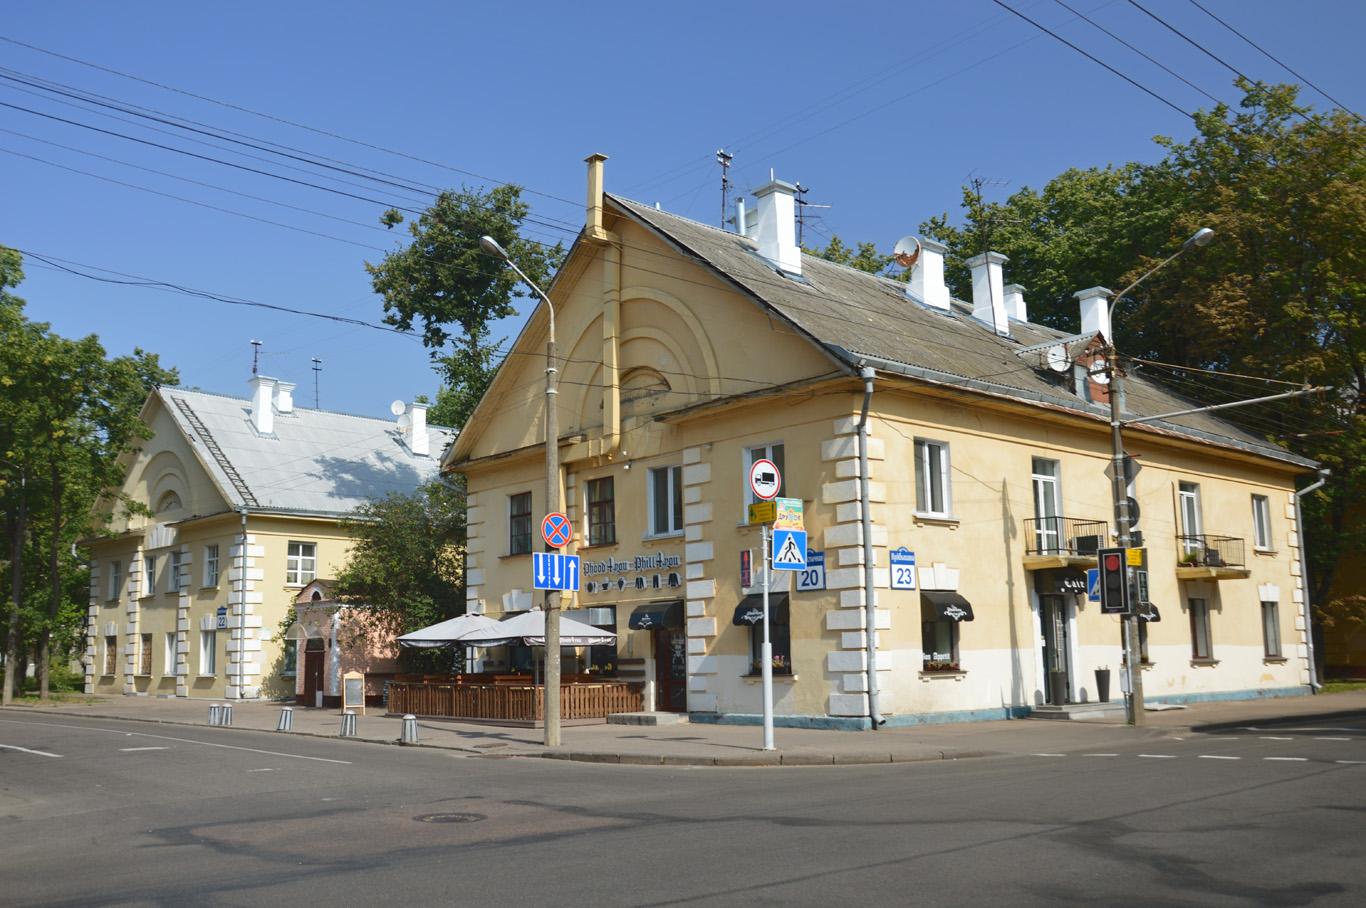 Houses in Minsk